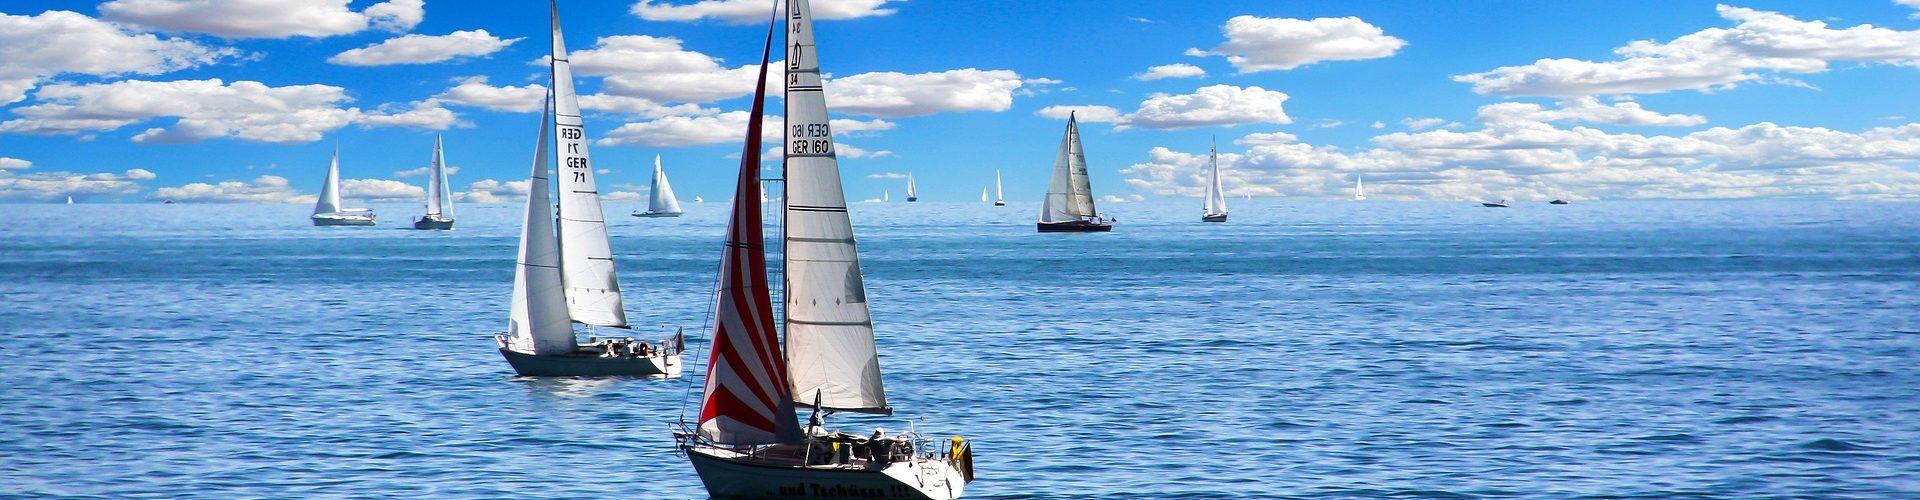 segeln lernen in Murnau am Staffelsee segelschein machen in Murnau am Staffelsee 1920x500 - Segeln lernen in Murnau am Staffelsee